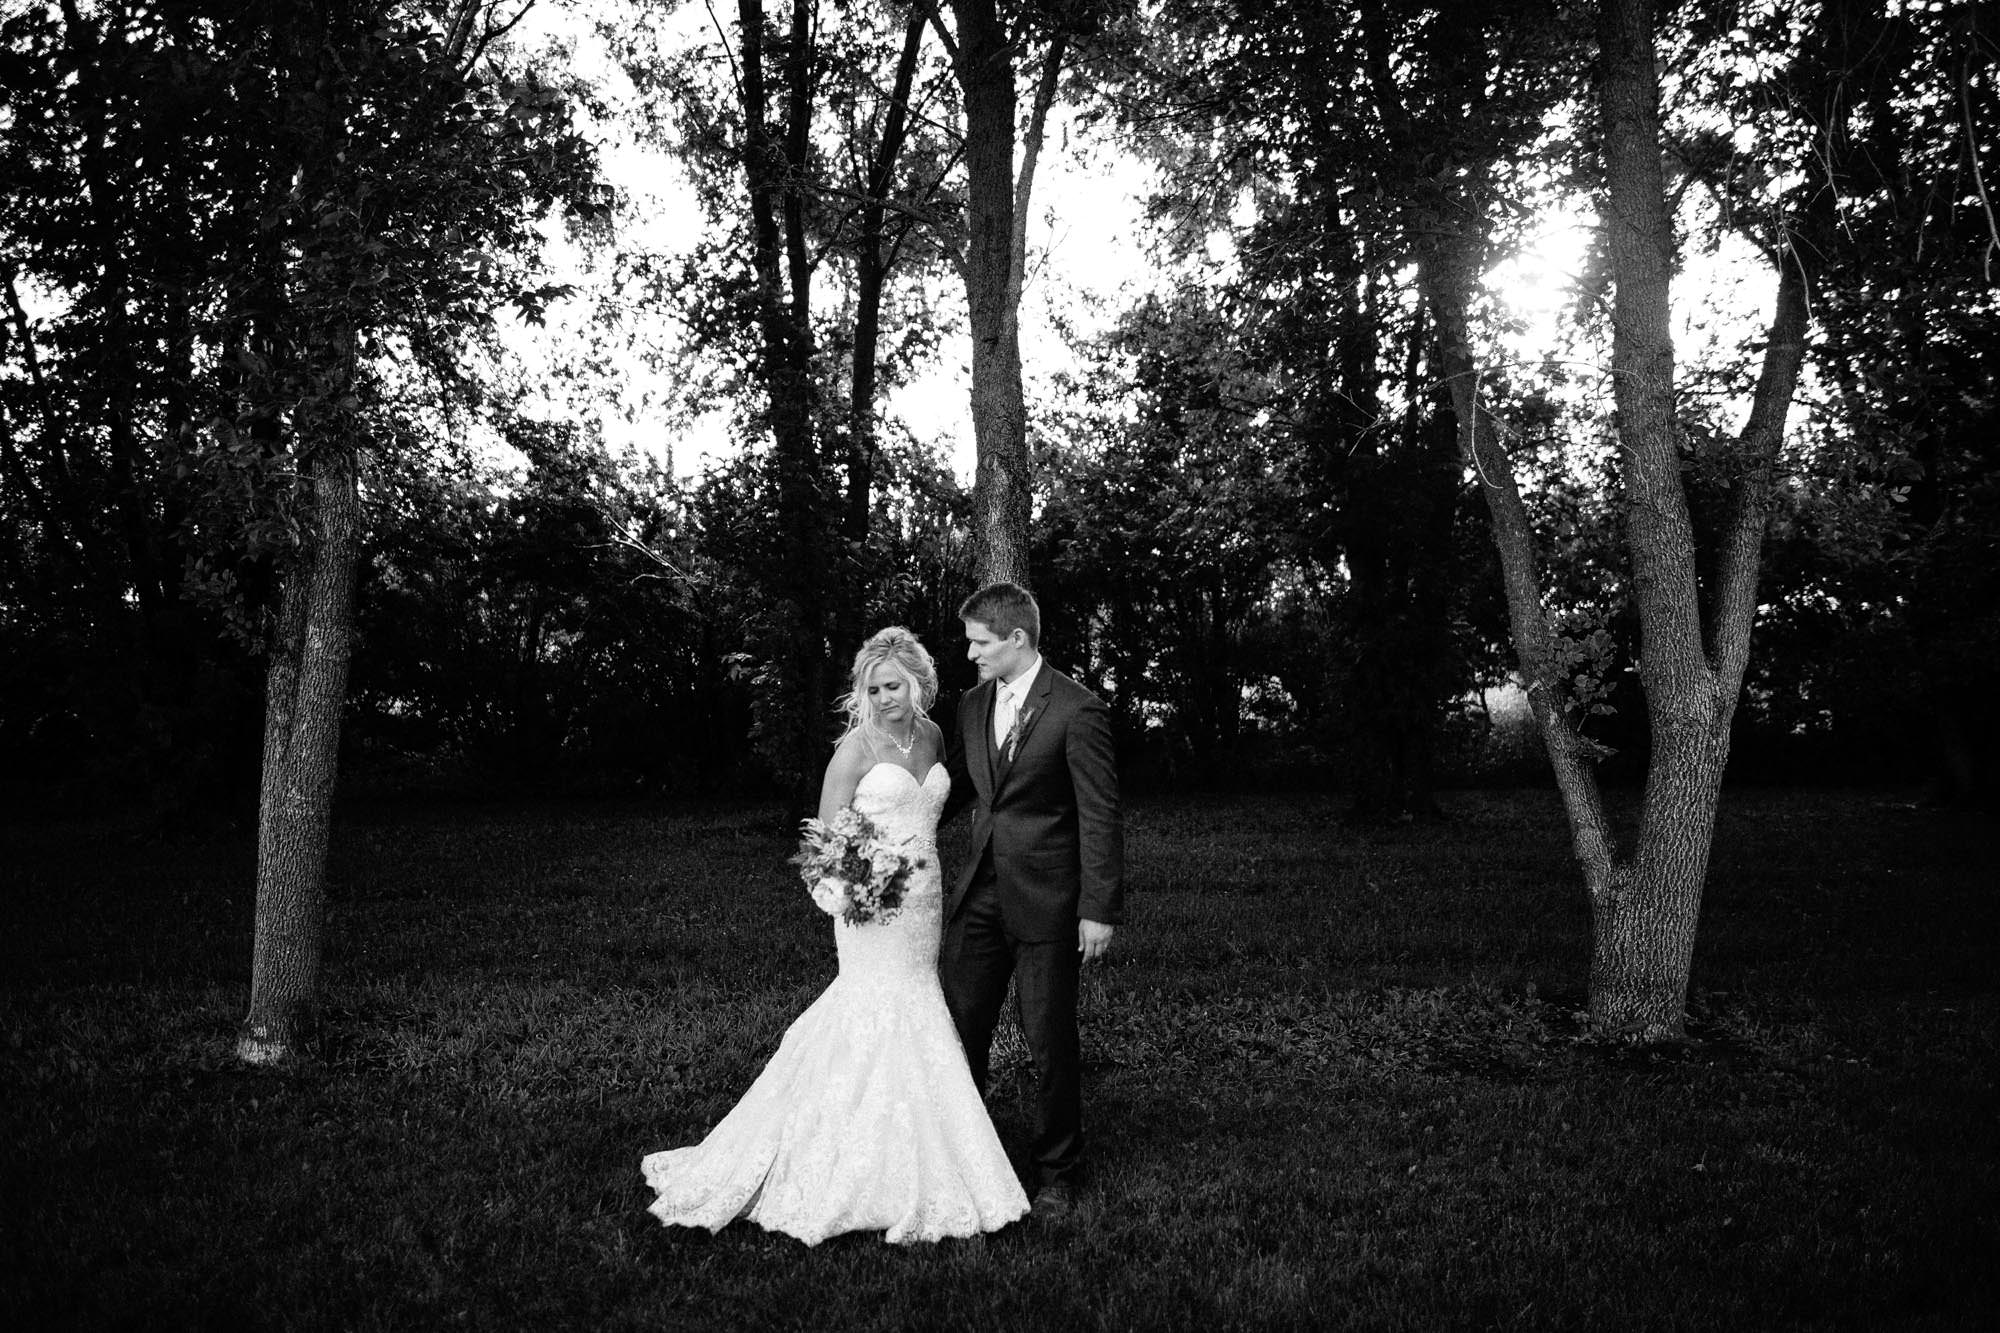 meadow-barn-wedding-sioux-falls-south-dakota-romantic-adventerous-michael-liedtke-photography084.jpg